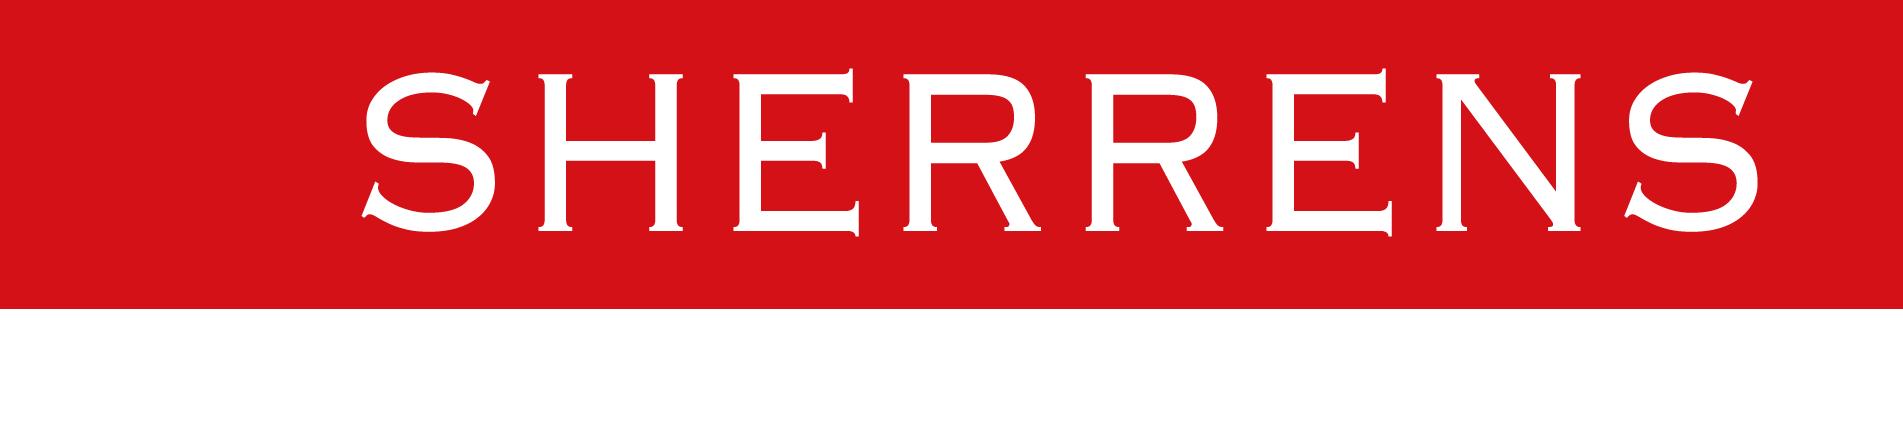 new-sherrens-logo-2019-header-big